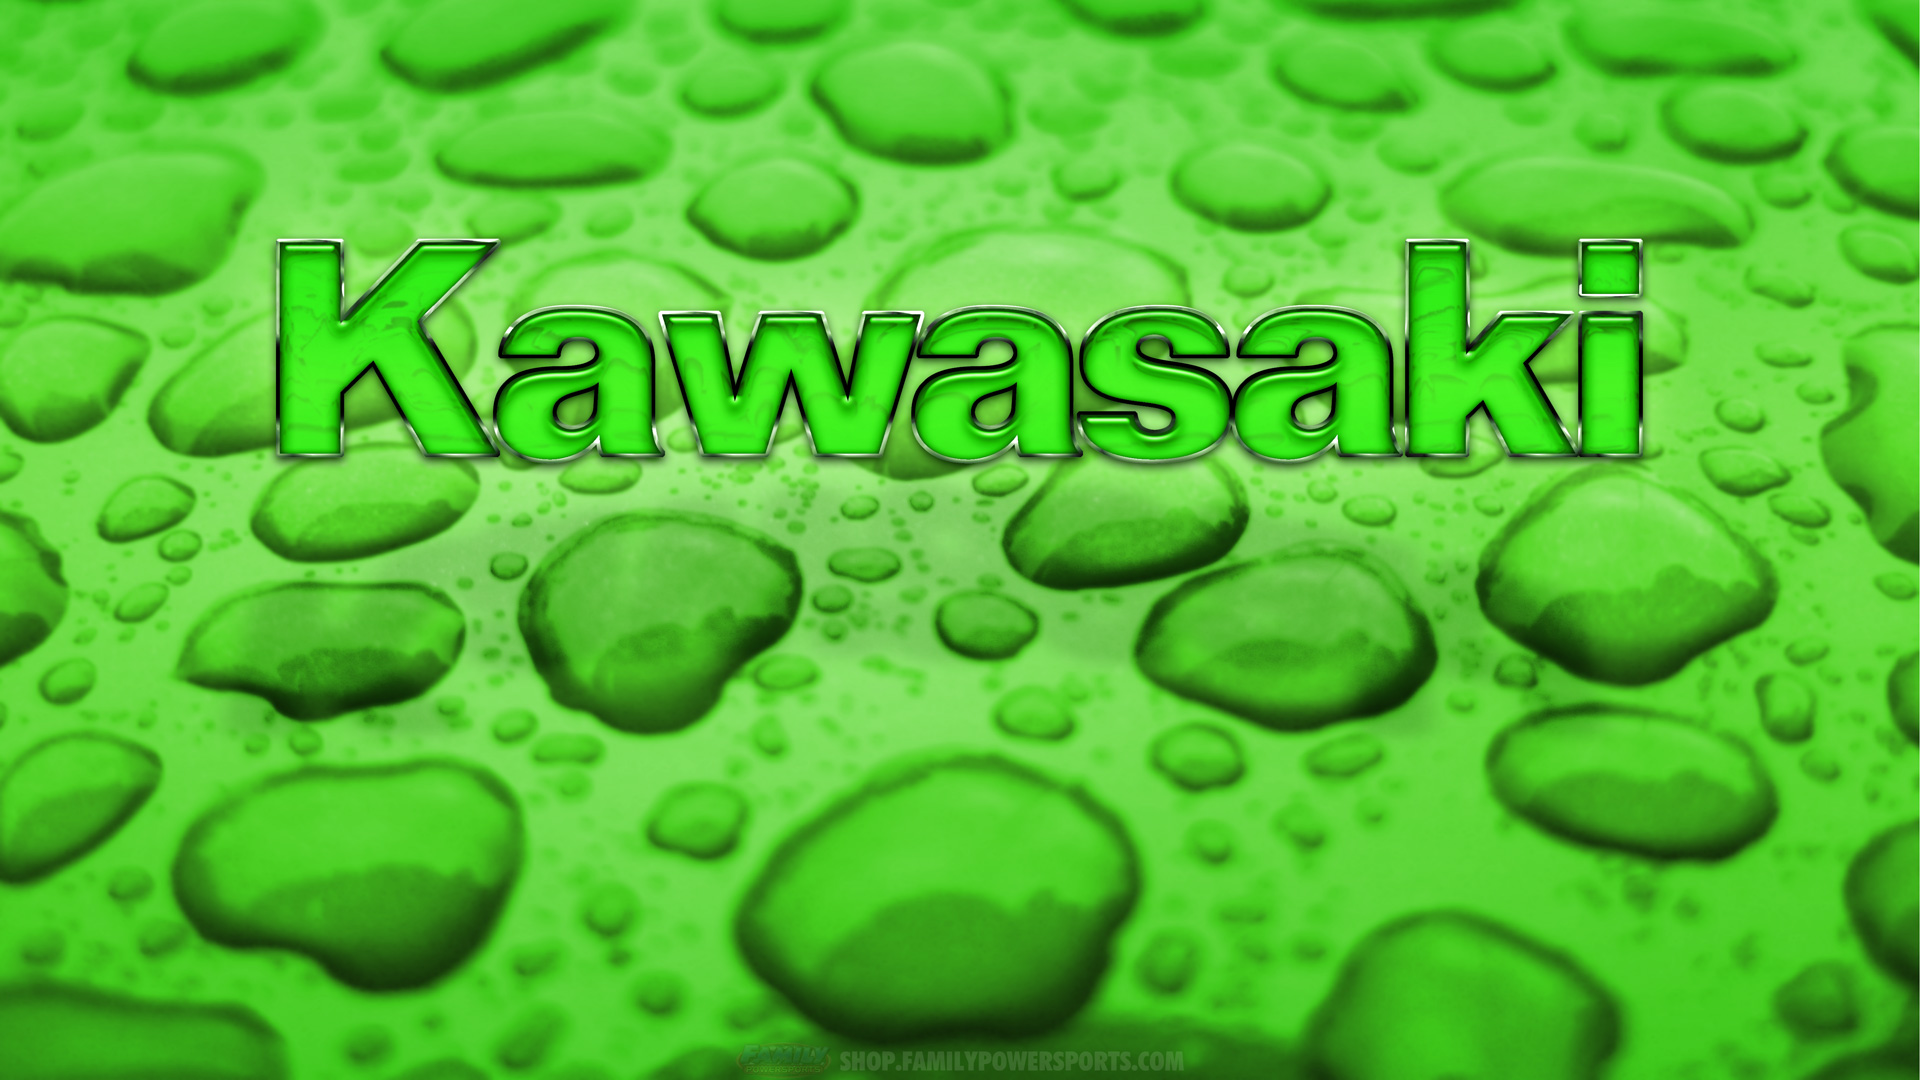 kawasaki ninja hd wallpaper